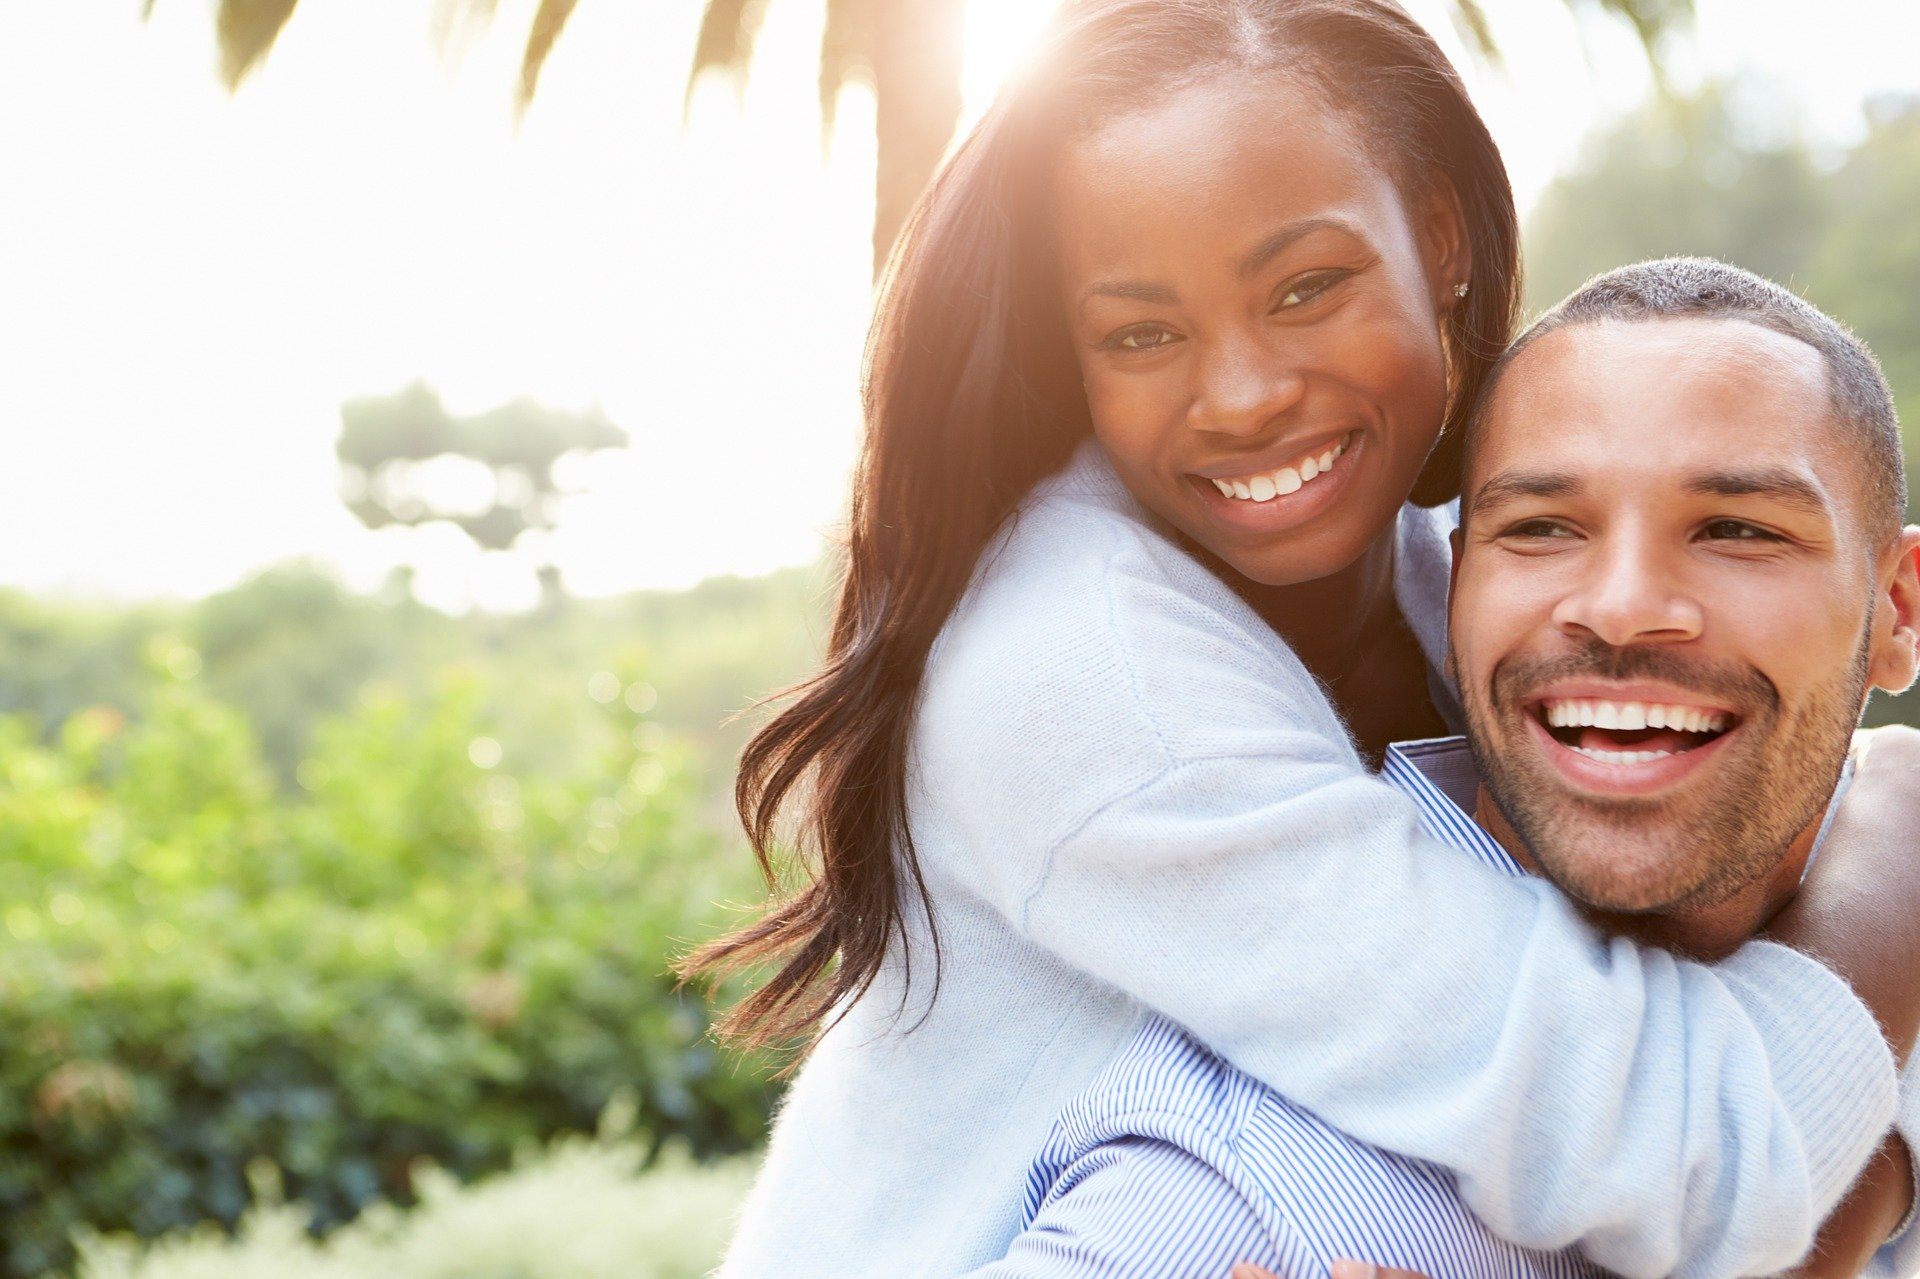 Fulfilling Relationships – 7 Common Sense Core Elements